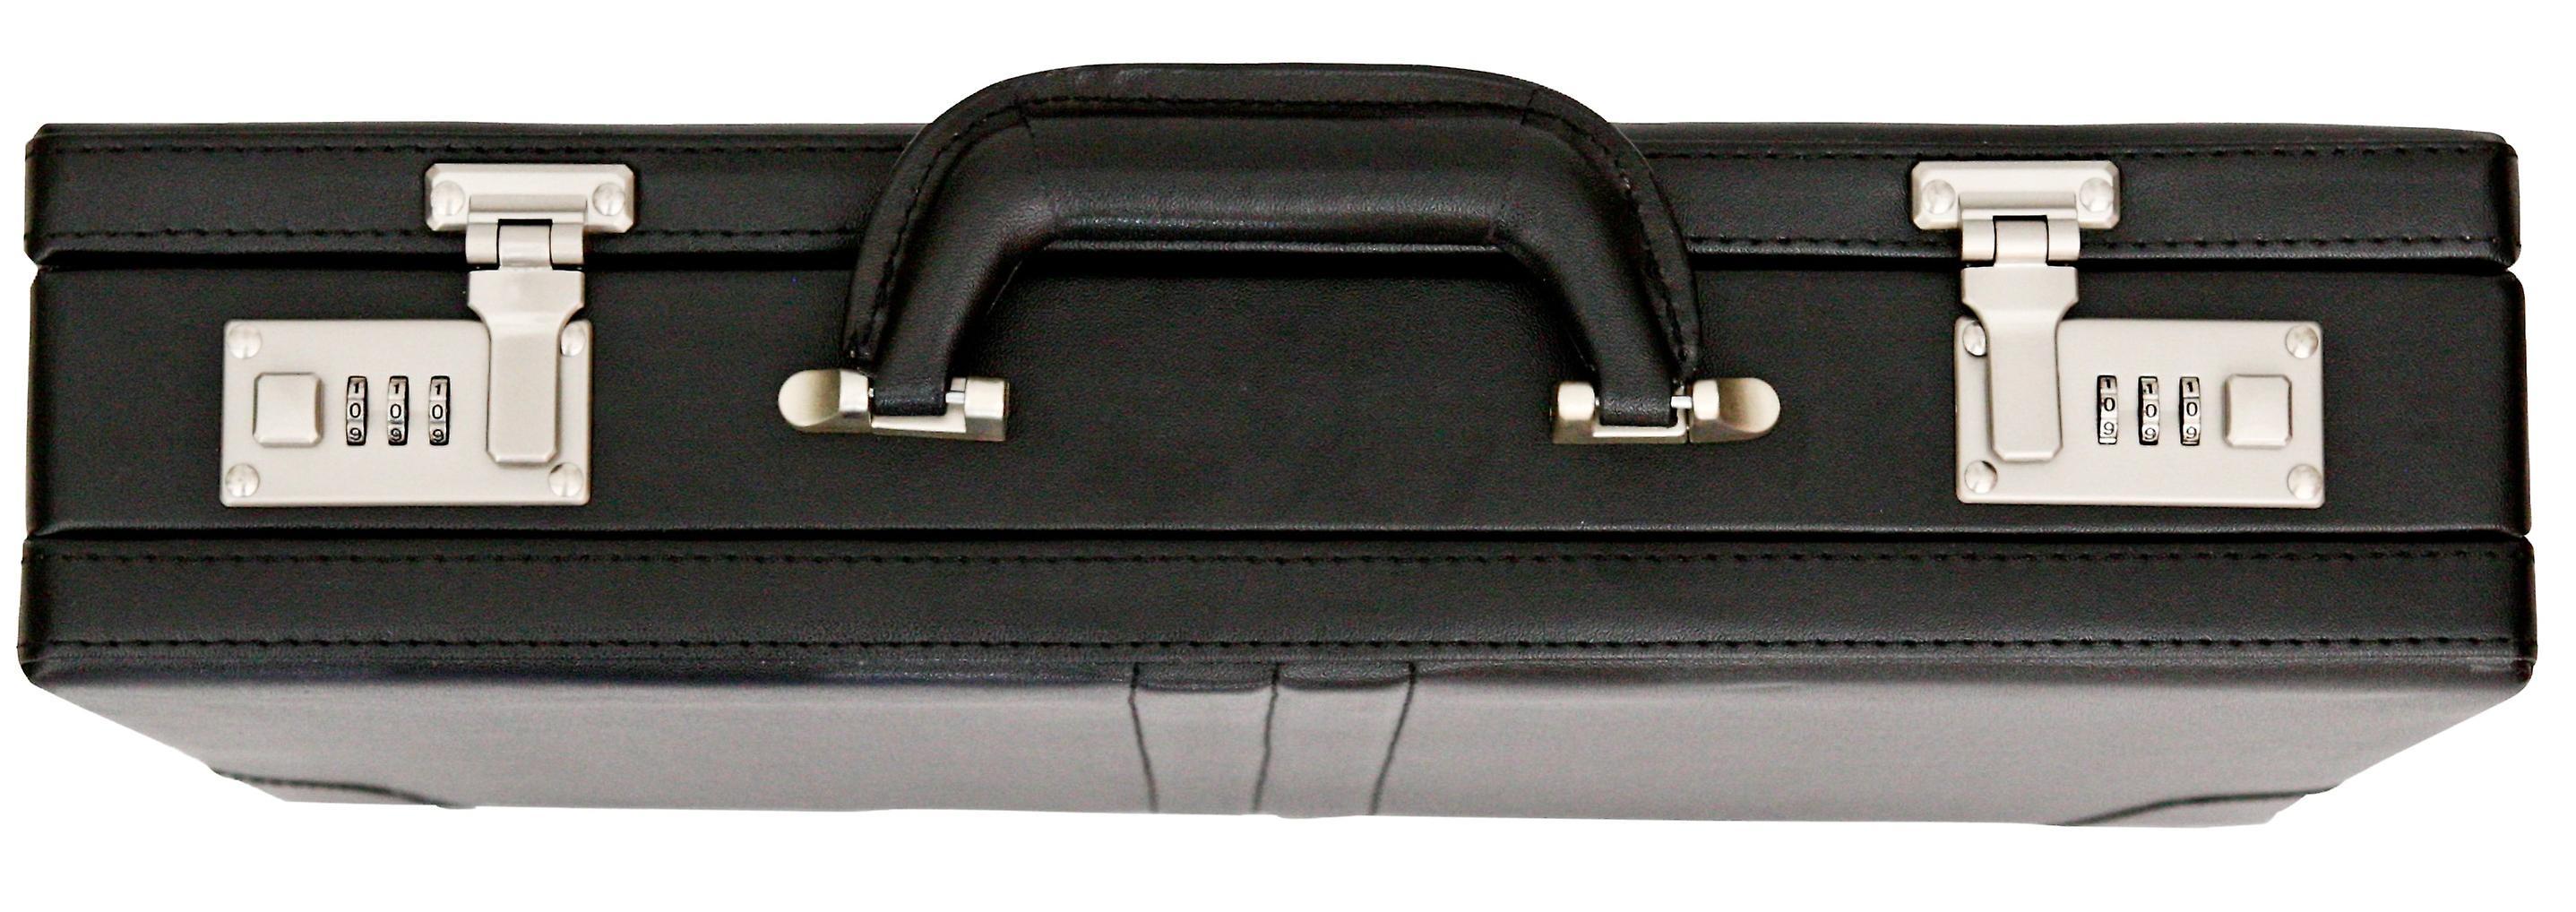 Tassia Attache Briefcase Leather Look Pu Executive Case Expanding Business Bag